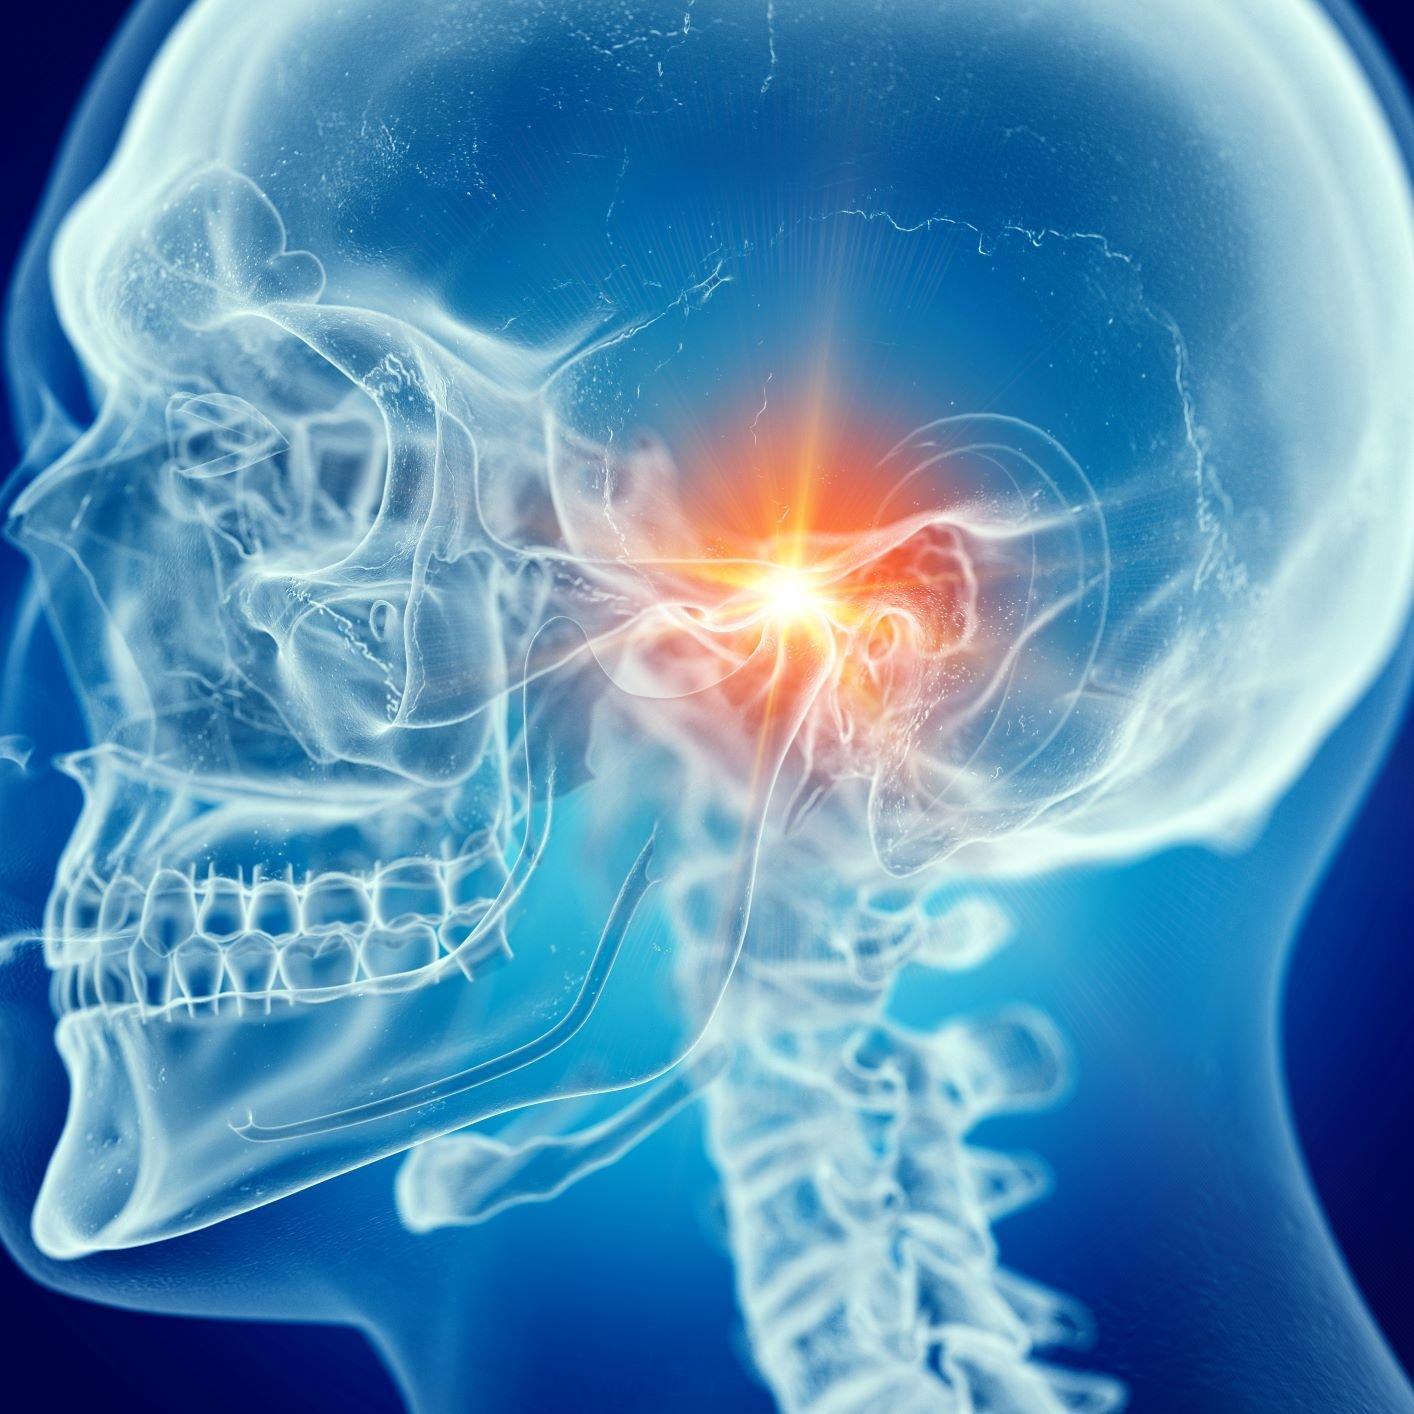 TMJ Diagnosis XRays, CT Scan, and MRI